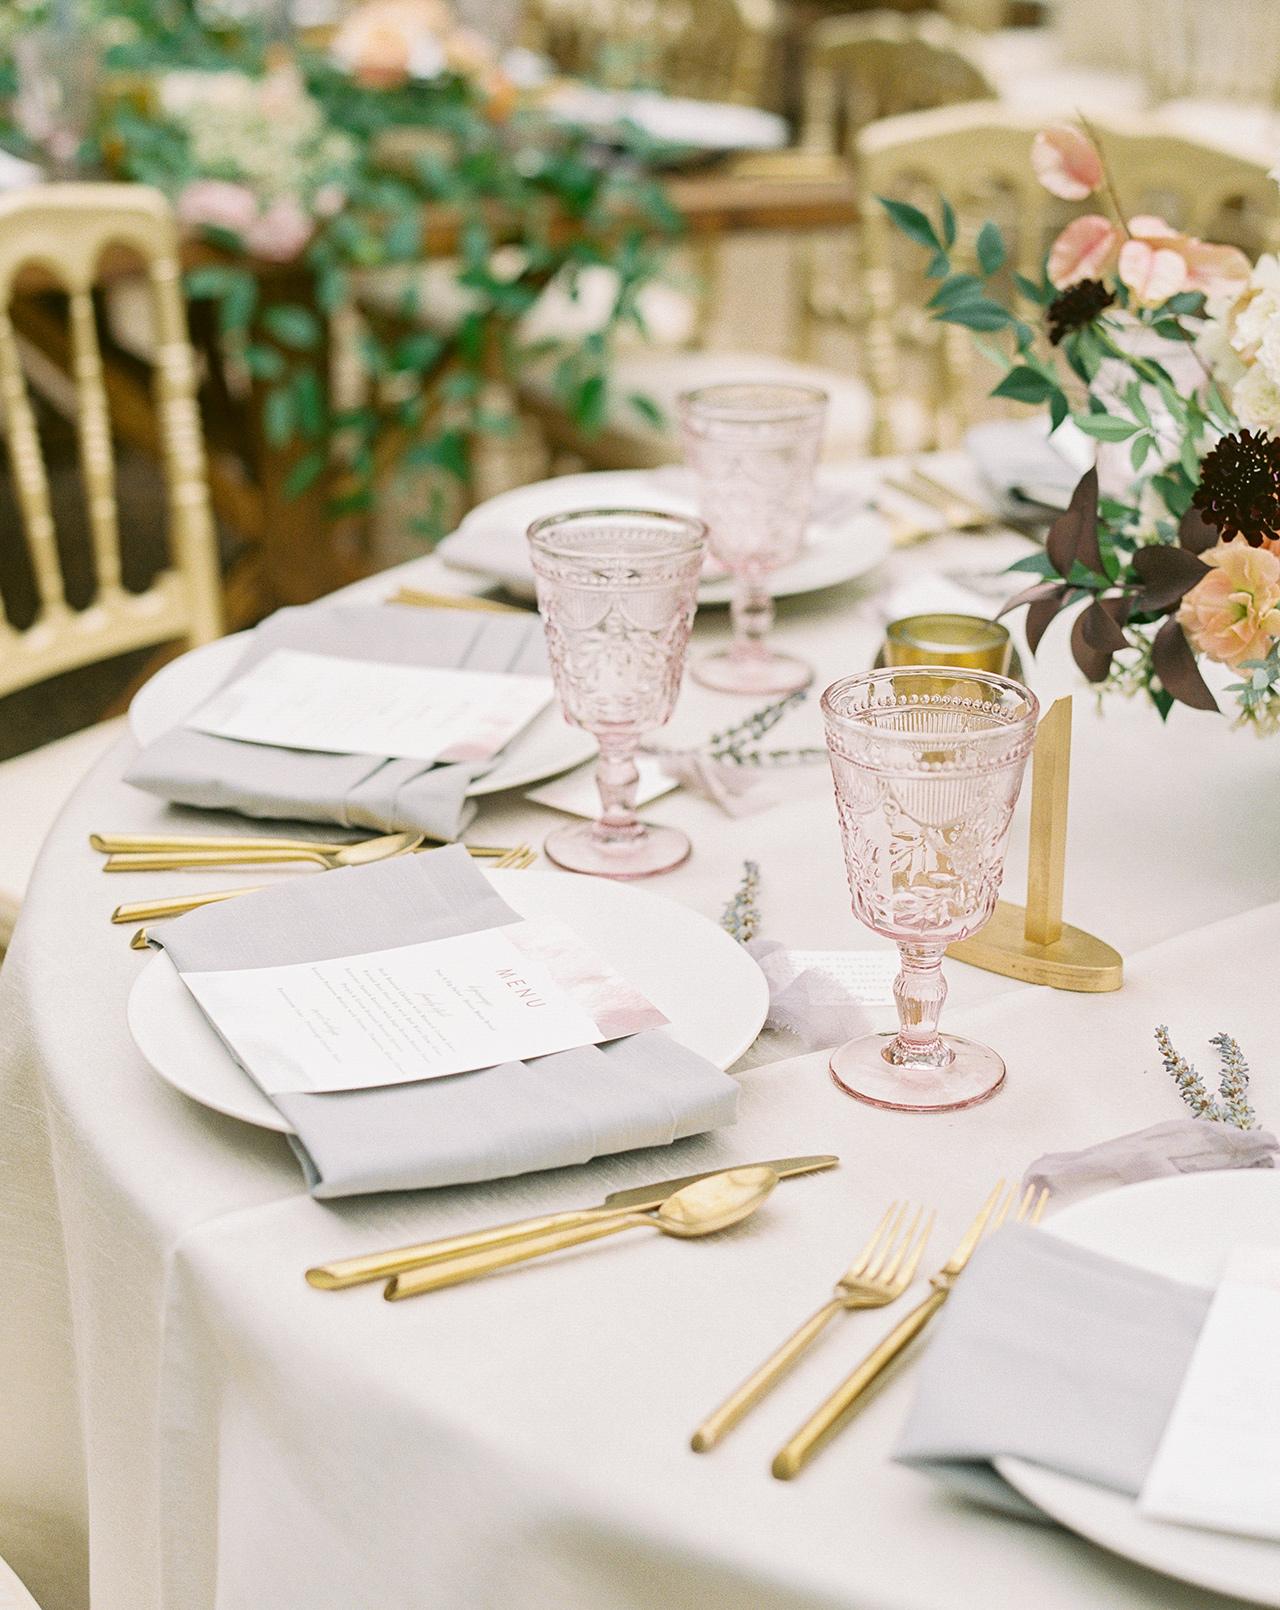 wedding reception table setting romantic glassware